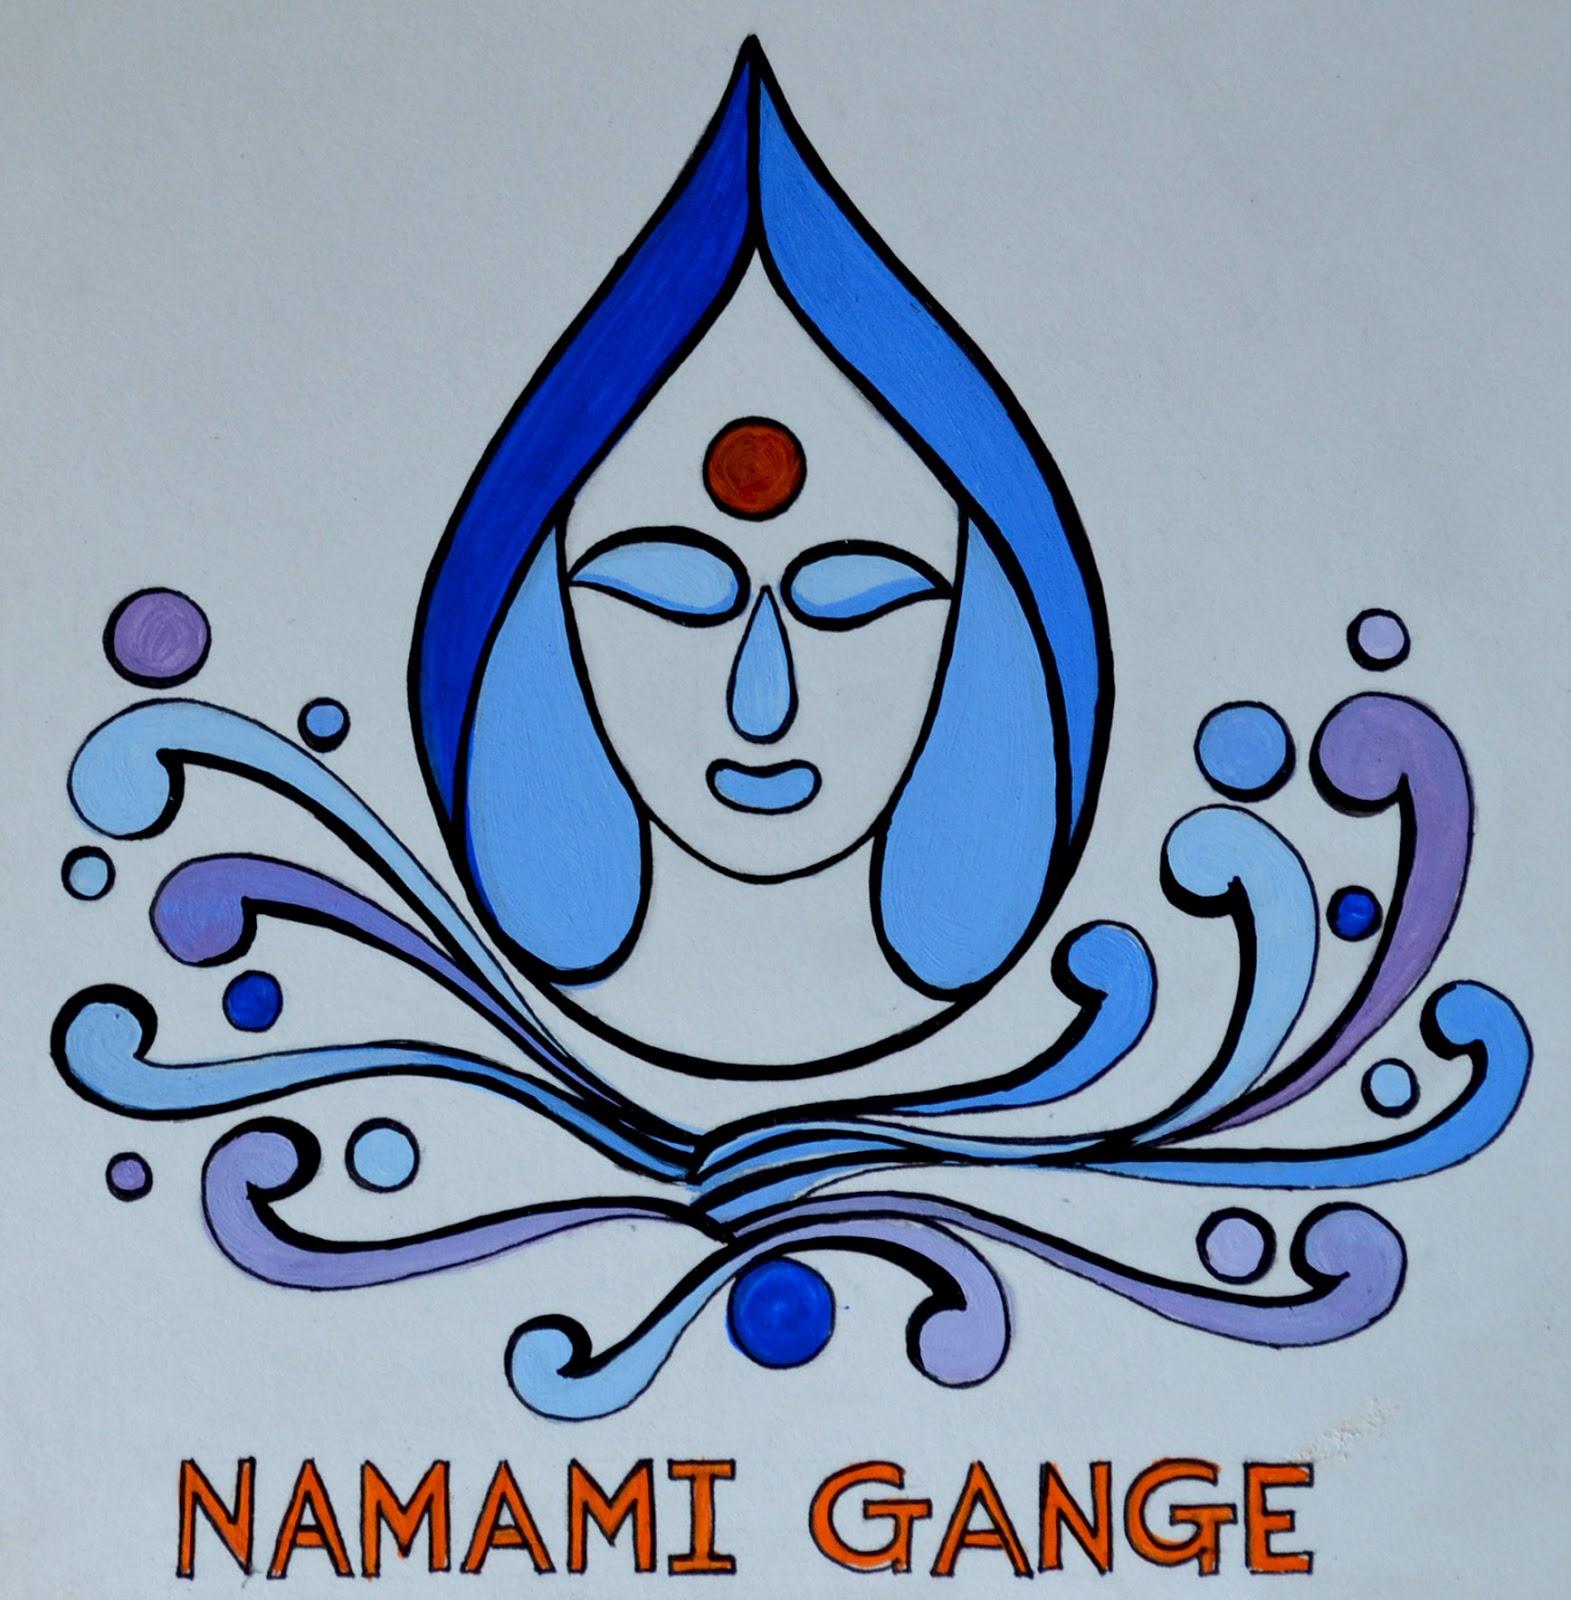 Swachh Ganga Abhiyan Pics for Free Download